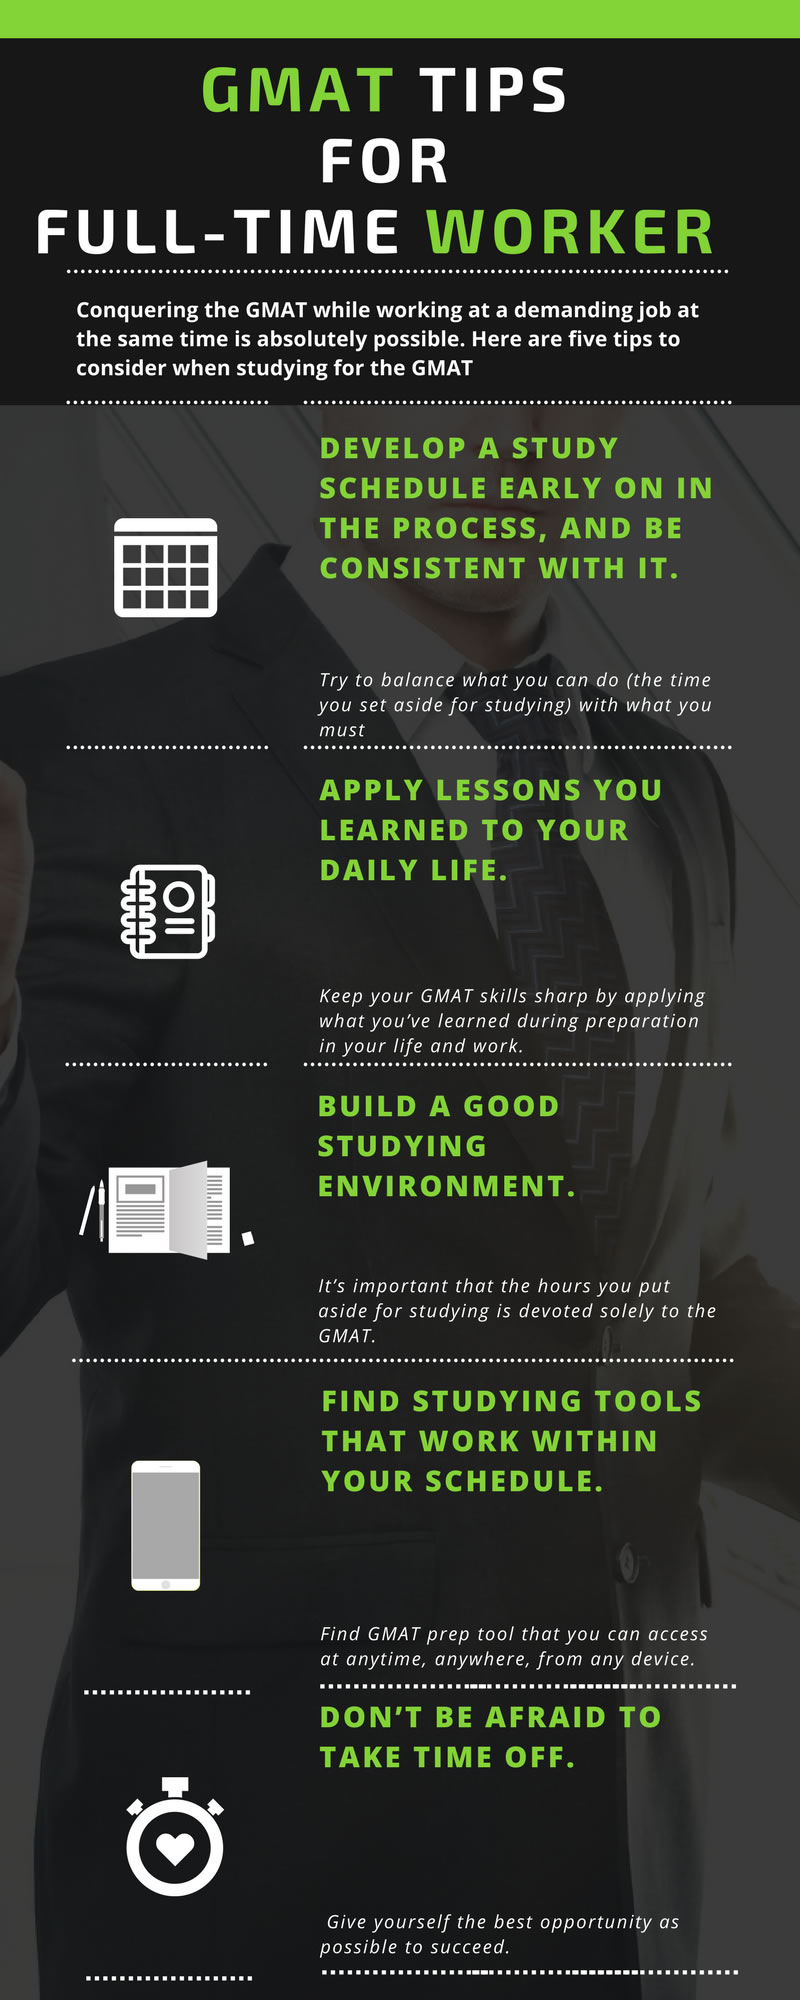 GMAT tips